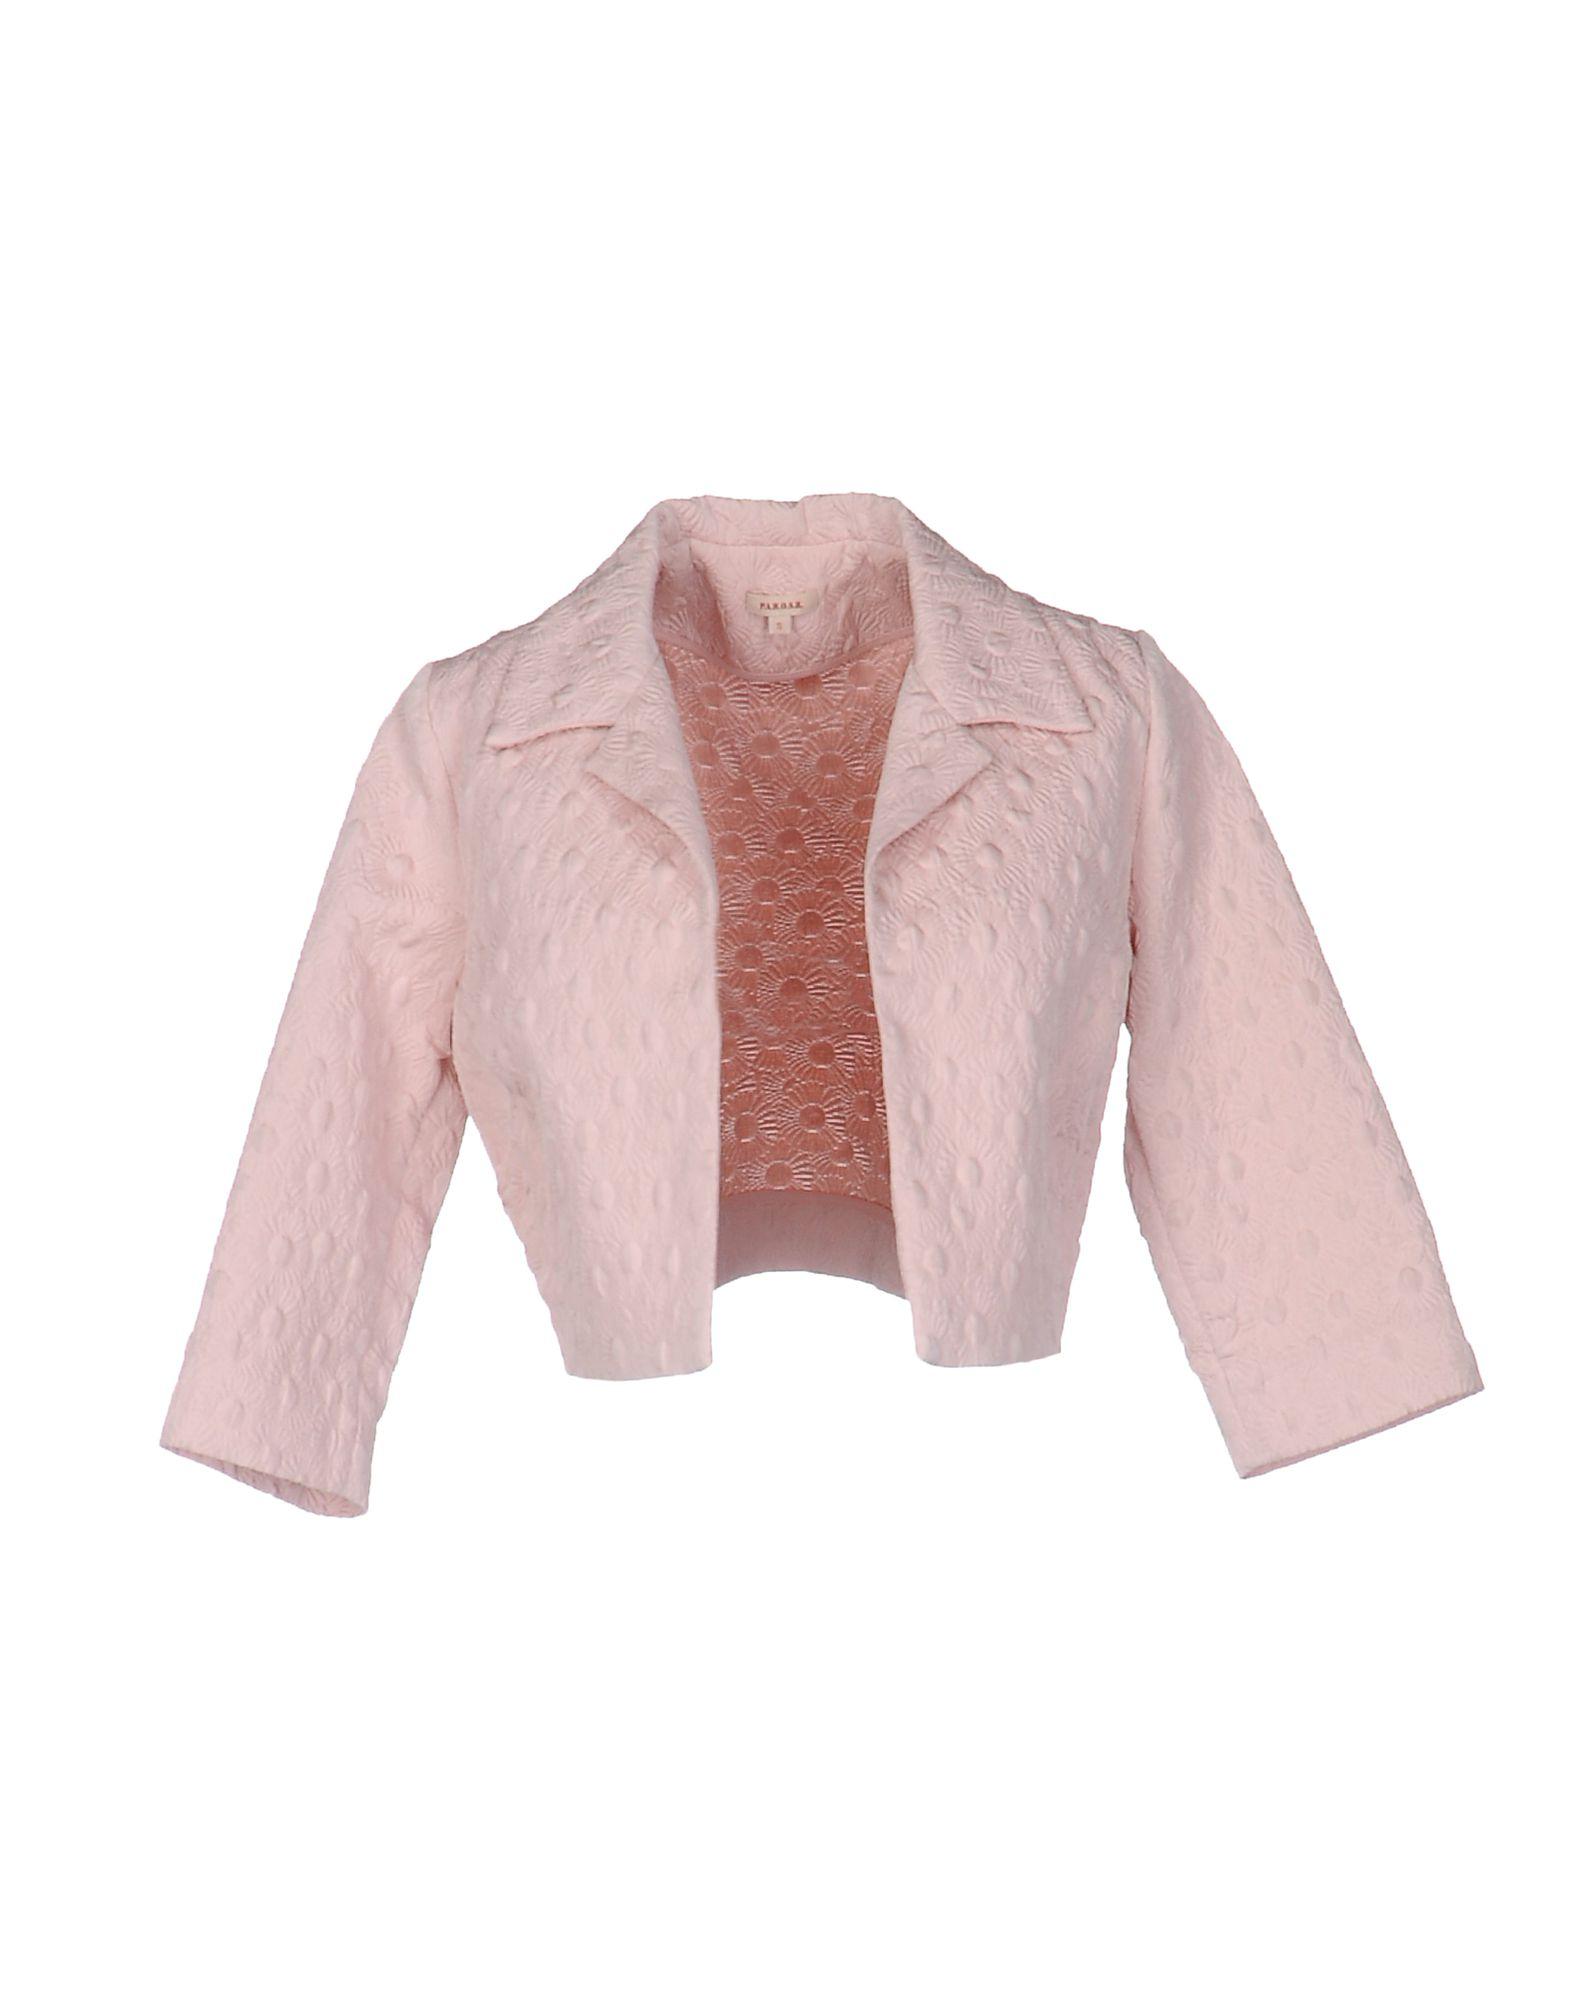 P.A.R.O.S.H. Damen Jackett Farbe Rosa Größe 4 jetztbilligerkaufen